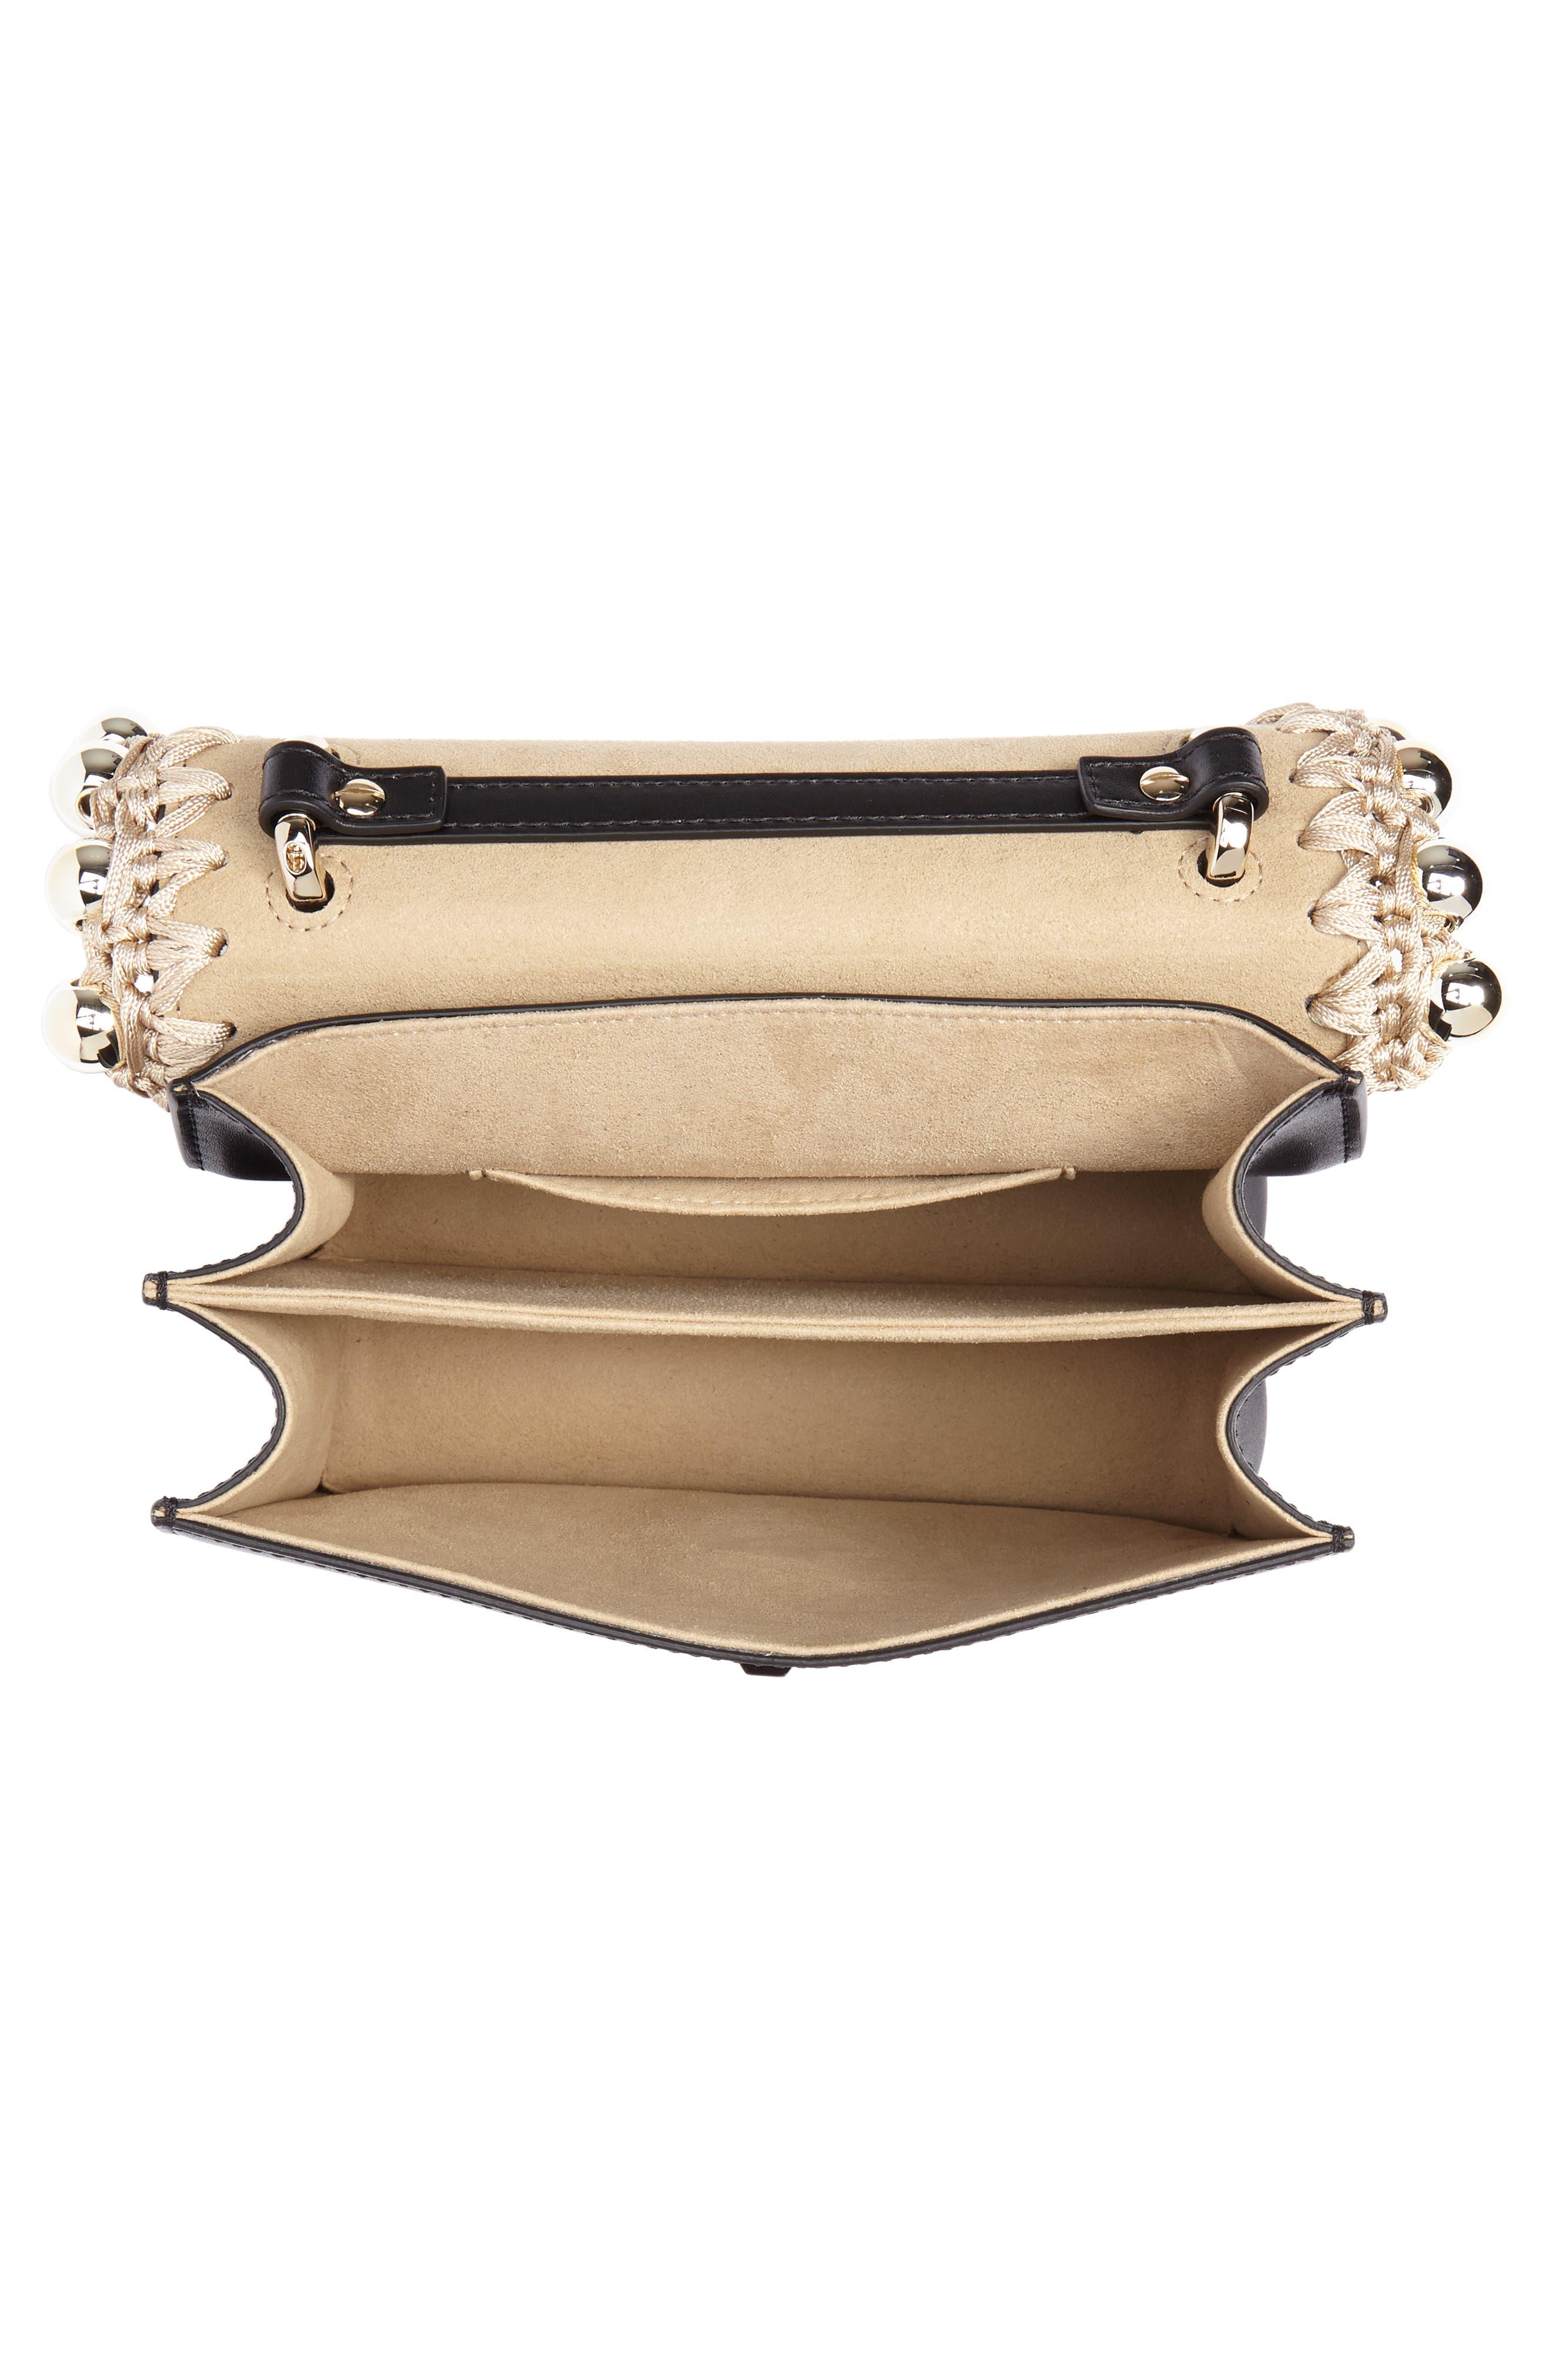 Small Kan I Leather Shoulder Bag,                             Alternate thumbnail 4, color,                             NERO/ ORO/ CHIARO